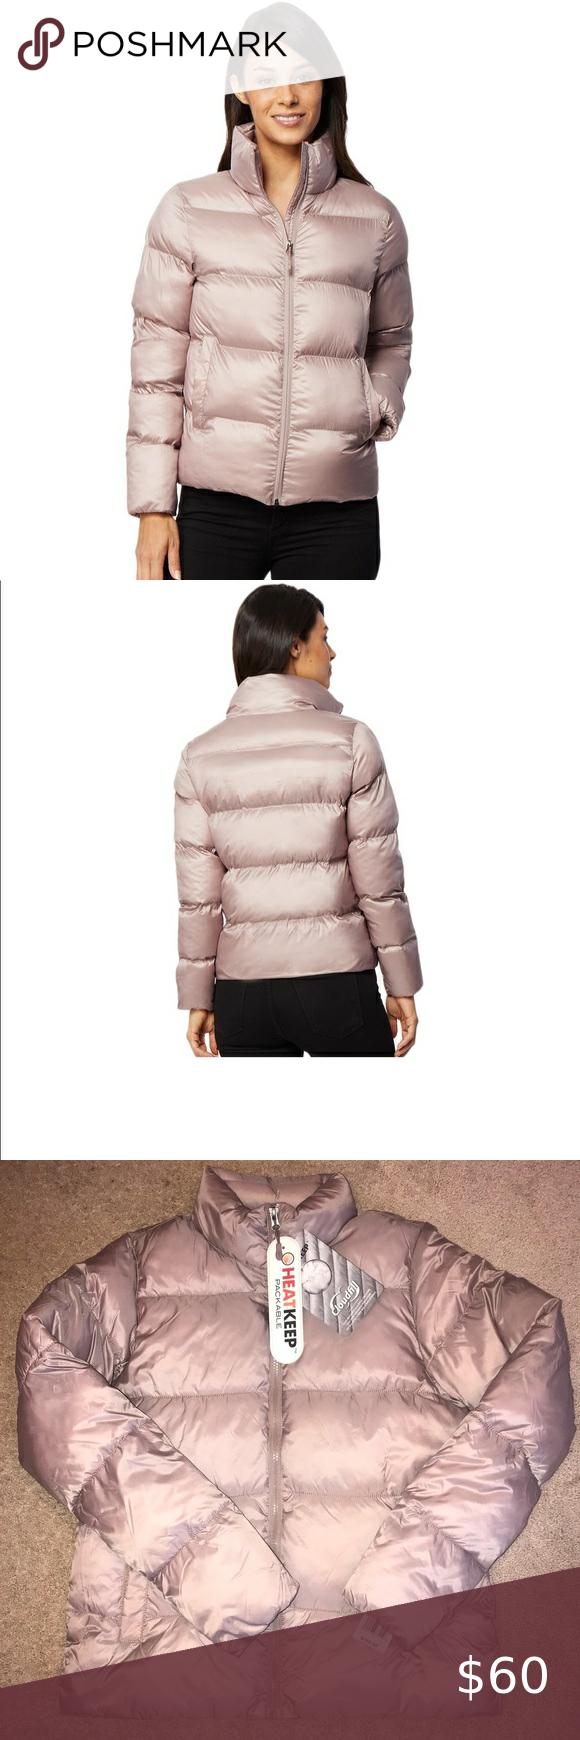 Sold Blush Packable Nano Puffer Jacket Puffer Jacket Women North Face Puffer Jacket Women S Puffer [ 1740 x 580 Pixel ]